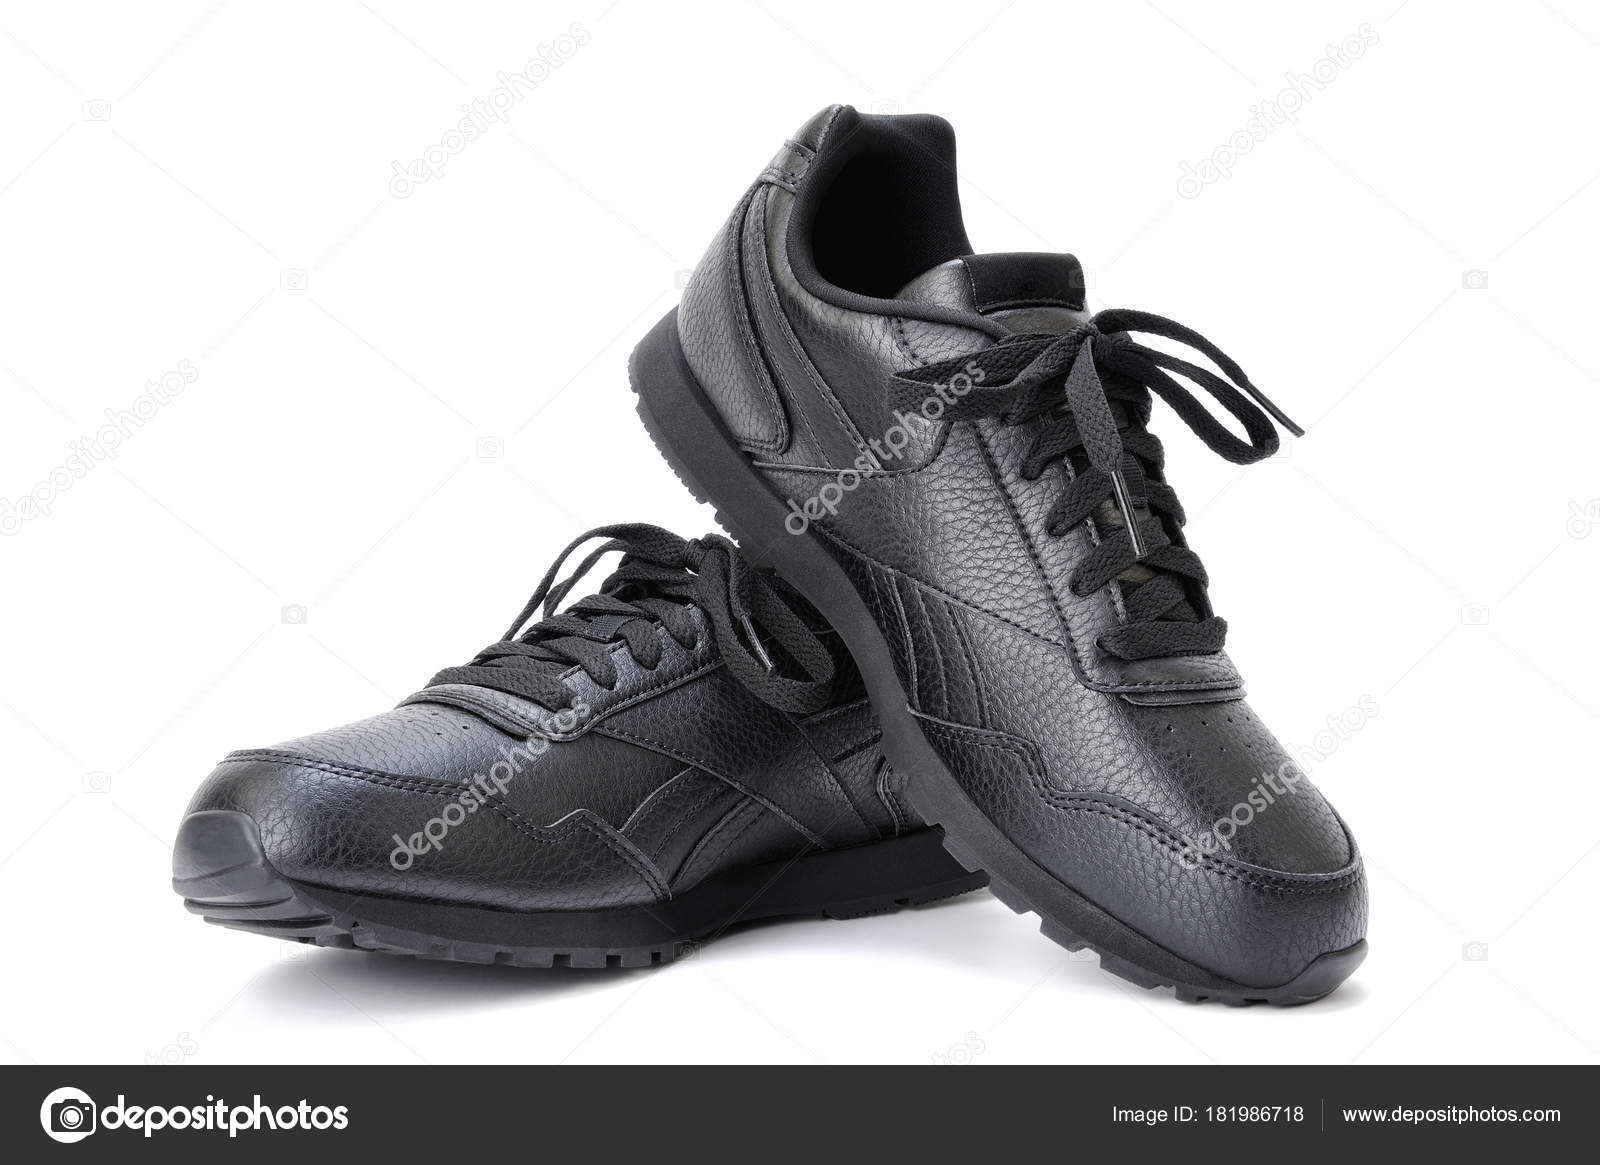 599002dec40 Μαύρο Γυναικείο αθλητικό παπούτσι σε λευκό φόντο — Φωτογραφία Αρχείου ·  Γκρο πλαν του ένα ζευγάρι μαύρα αθλητικά παπούτσια για τις γυναίκες, ...